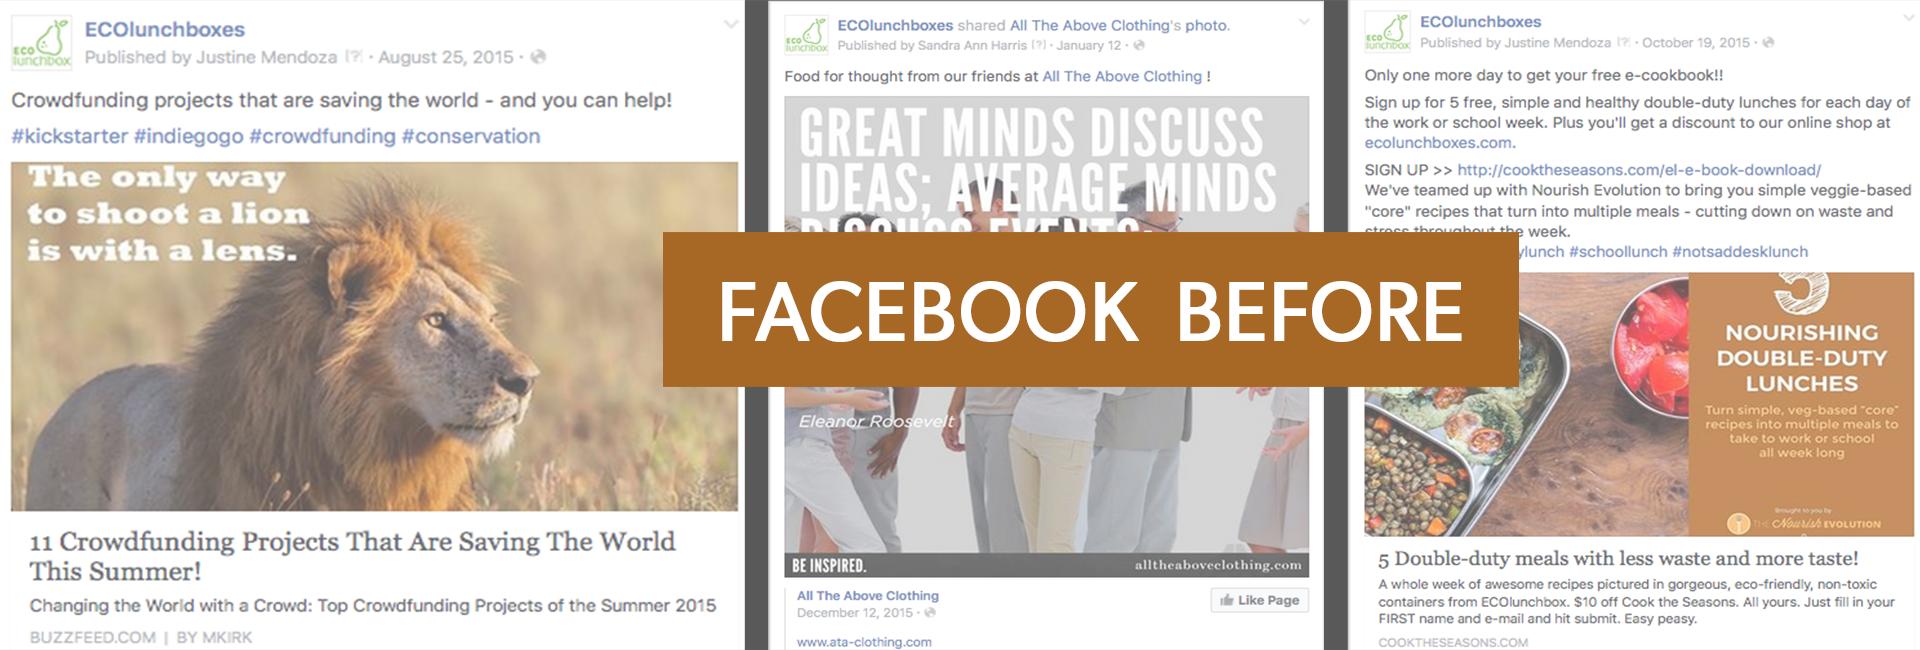 ecolunchbox_facebook_before